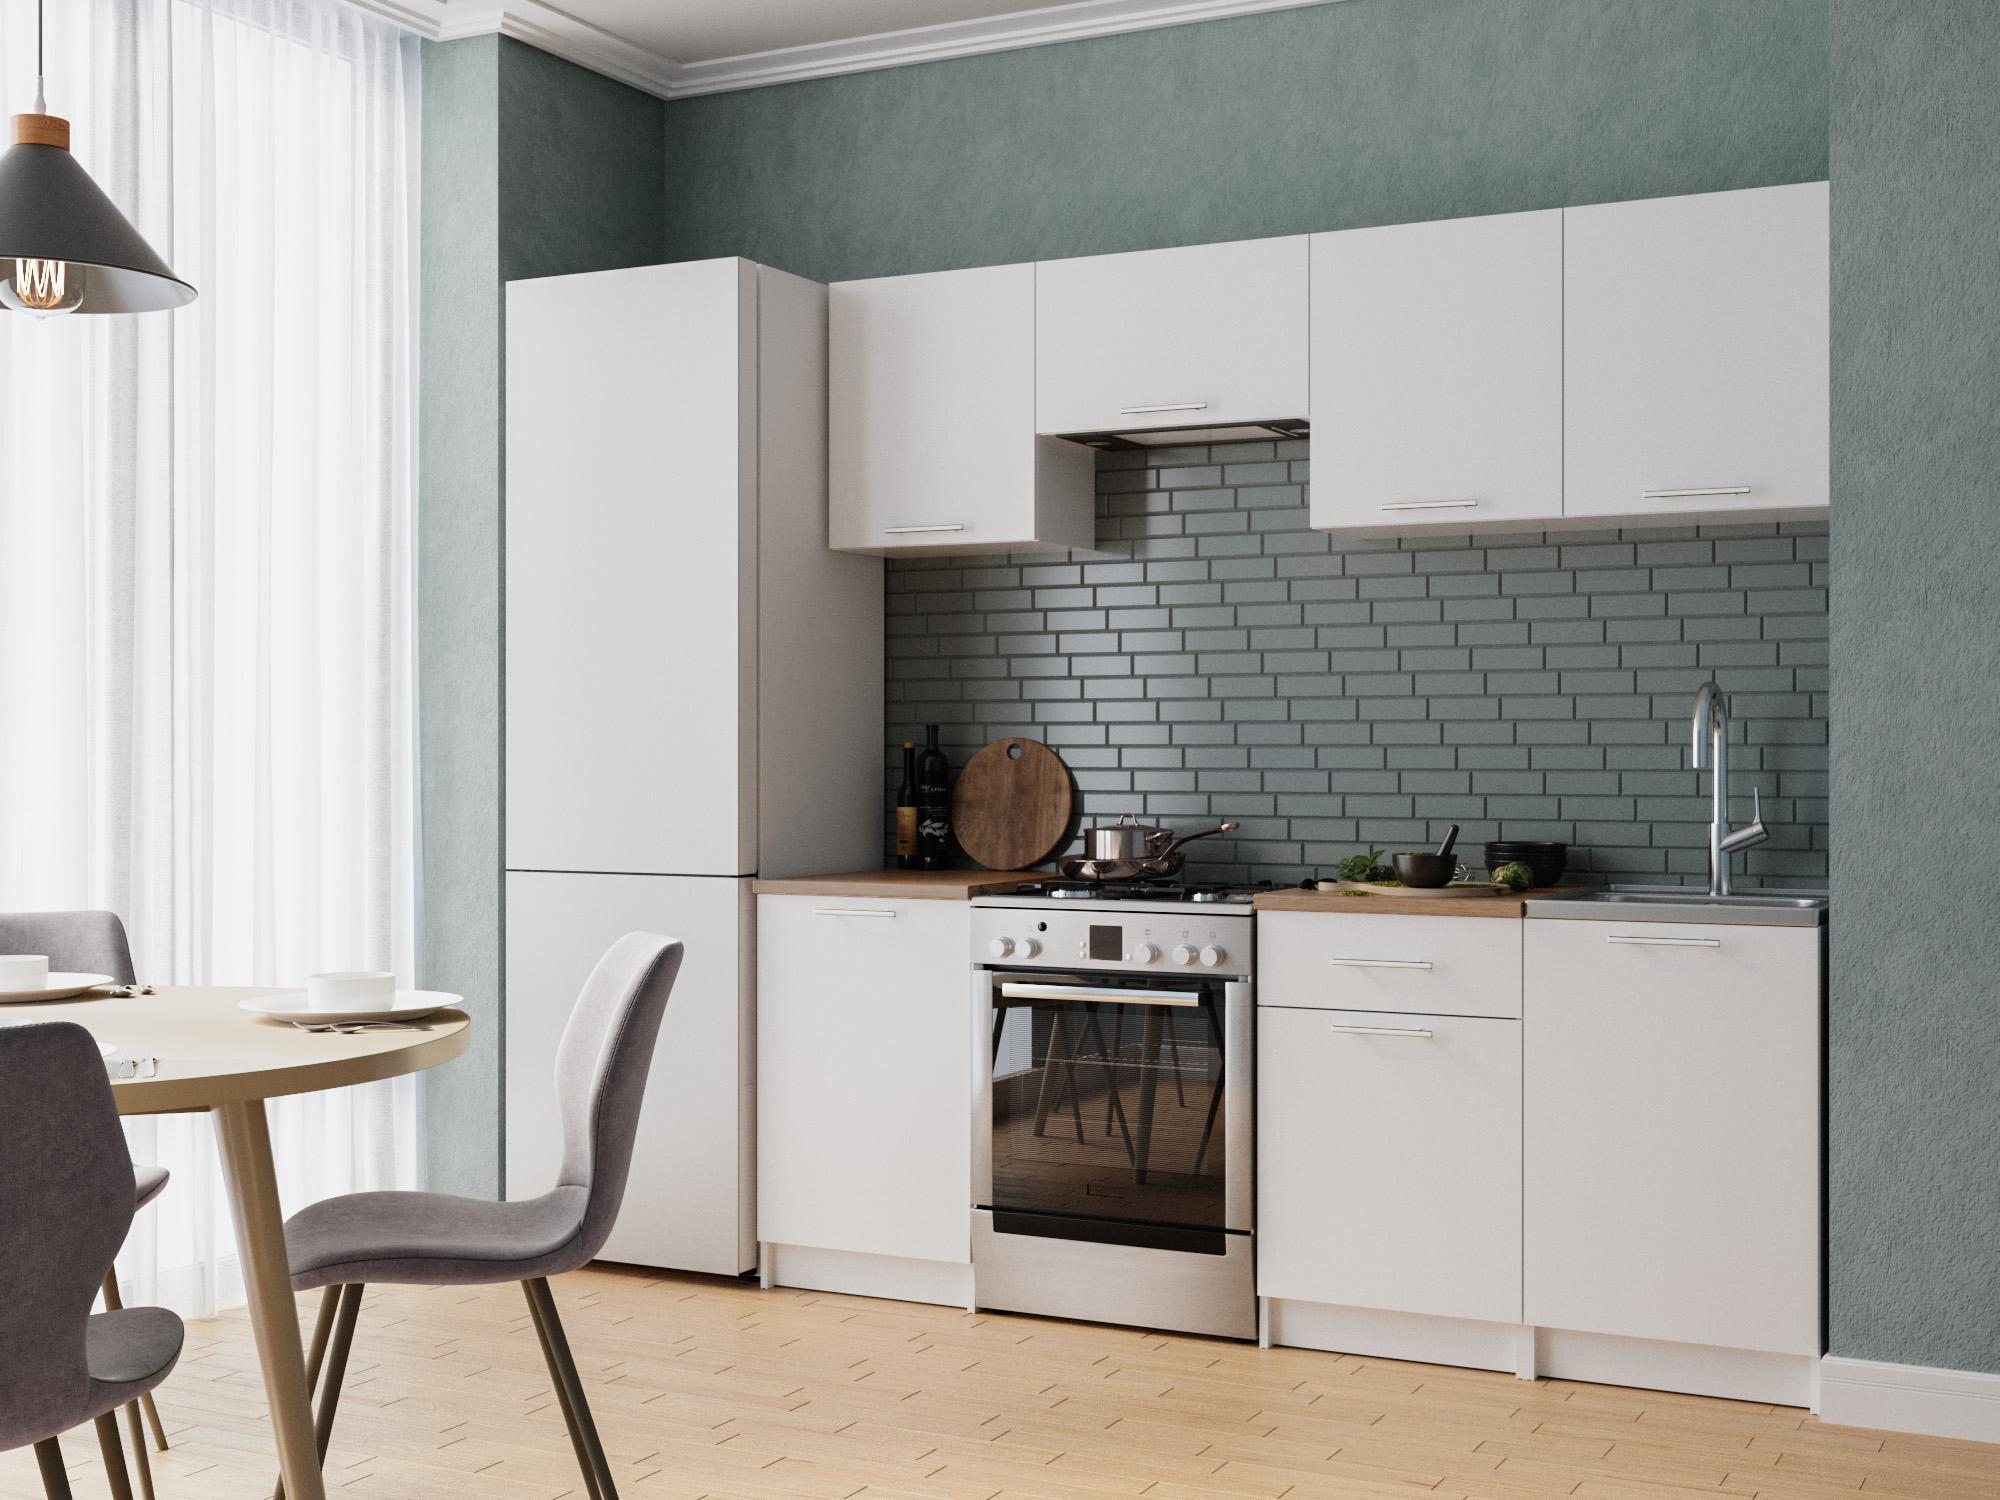 Кухня Адель 2,1 м Белый, , ЛДСП Белый